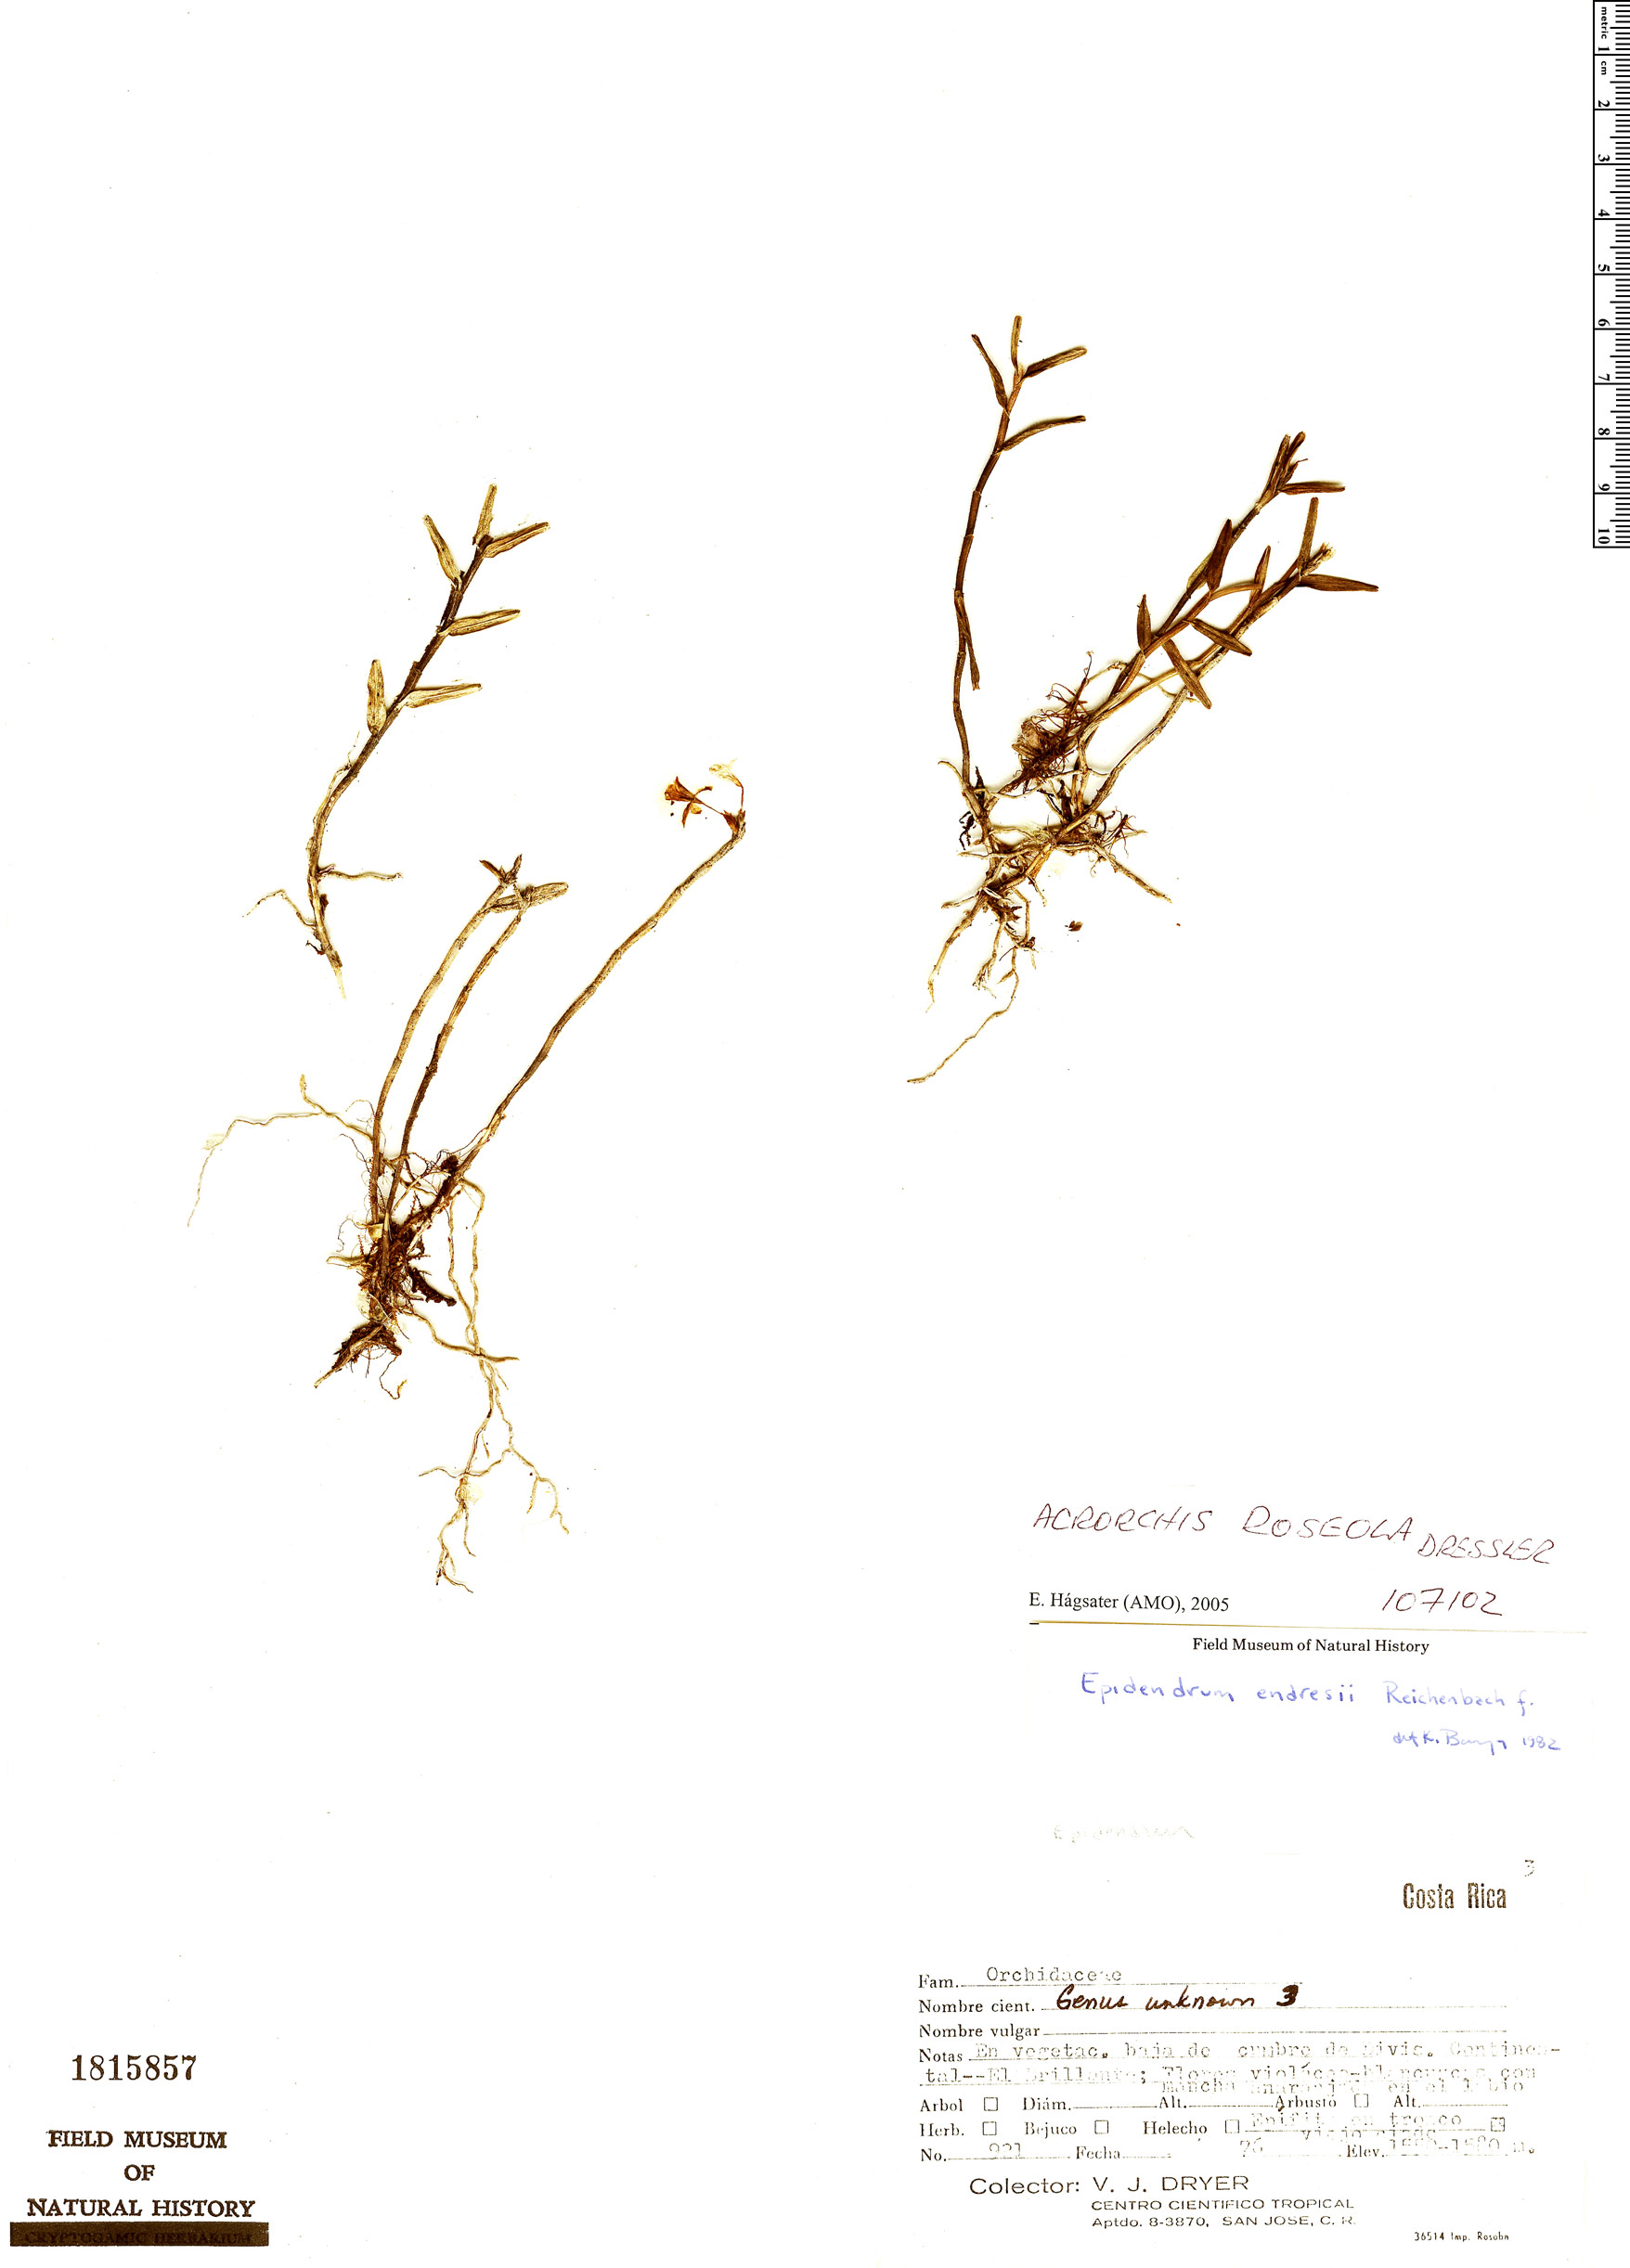 Specimen: Acrorchis roseola